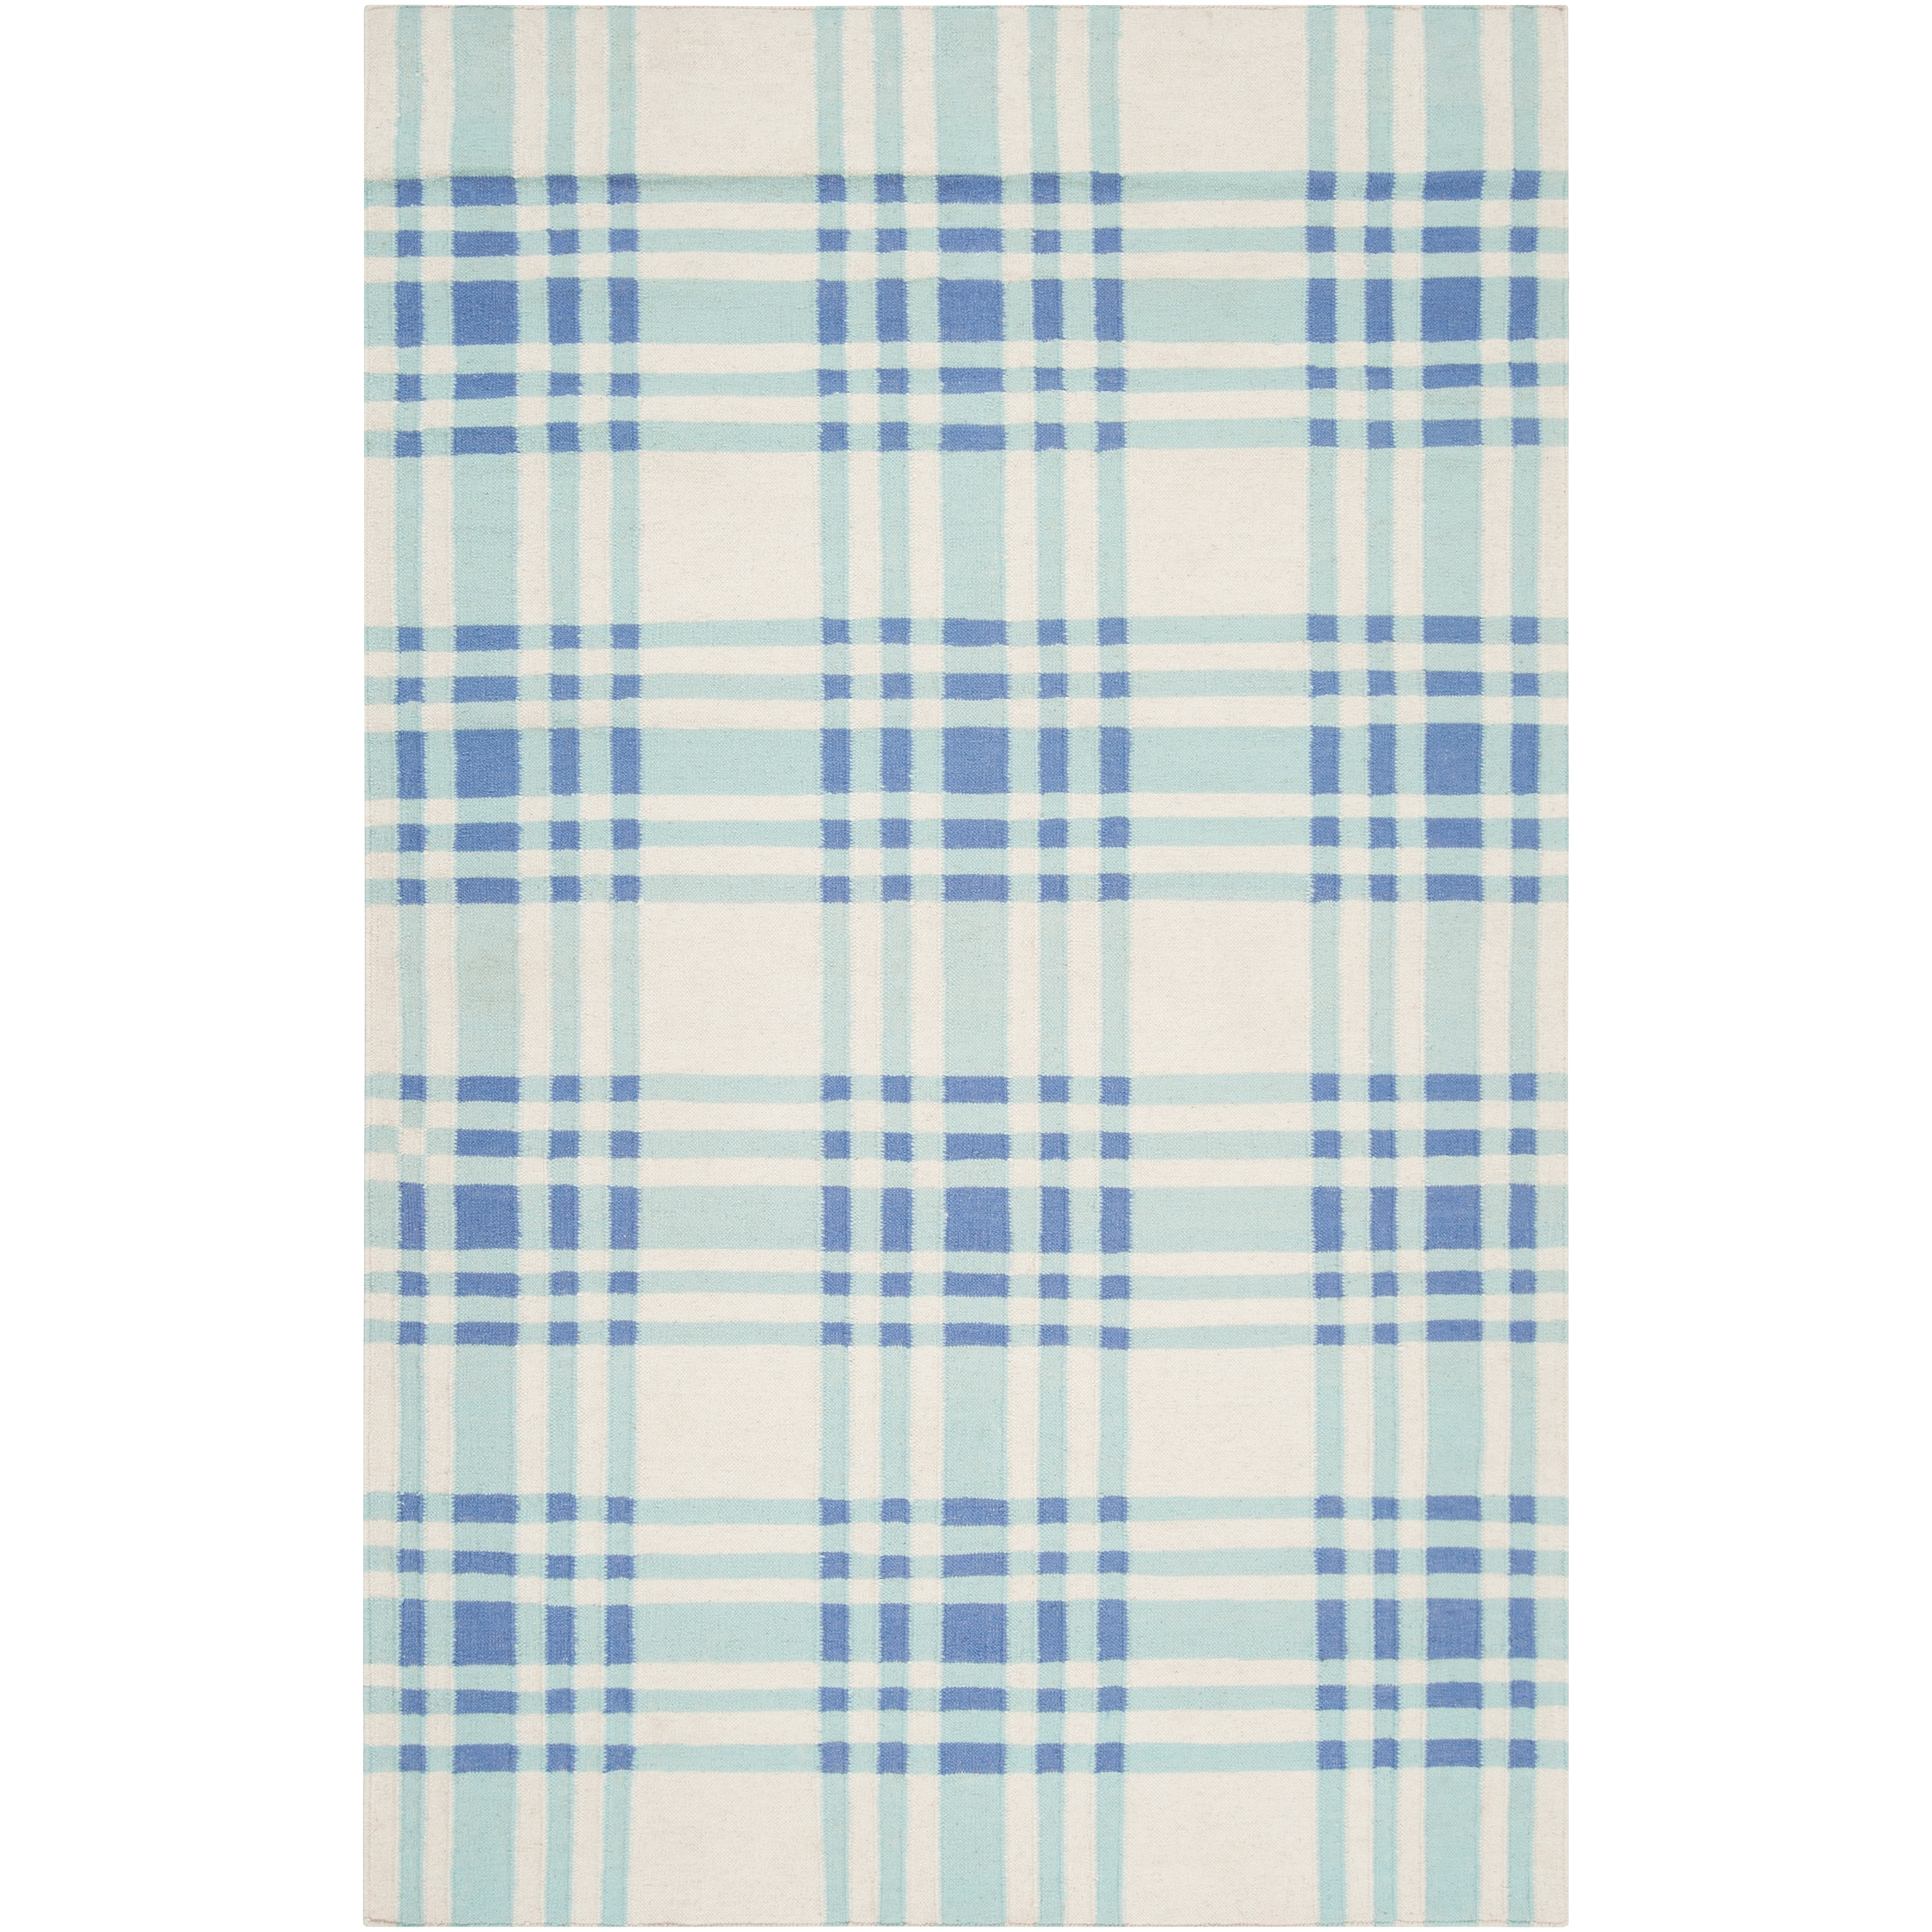 Hand-woven Blue High Kite Wool Rug (8' x 11')